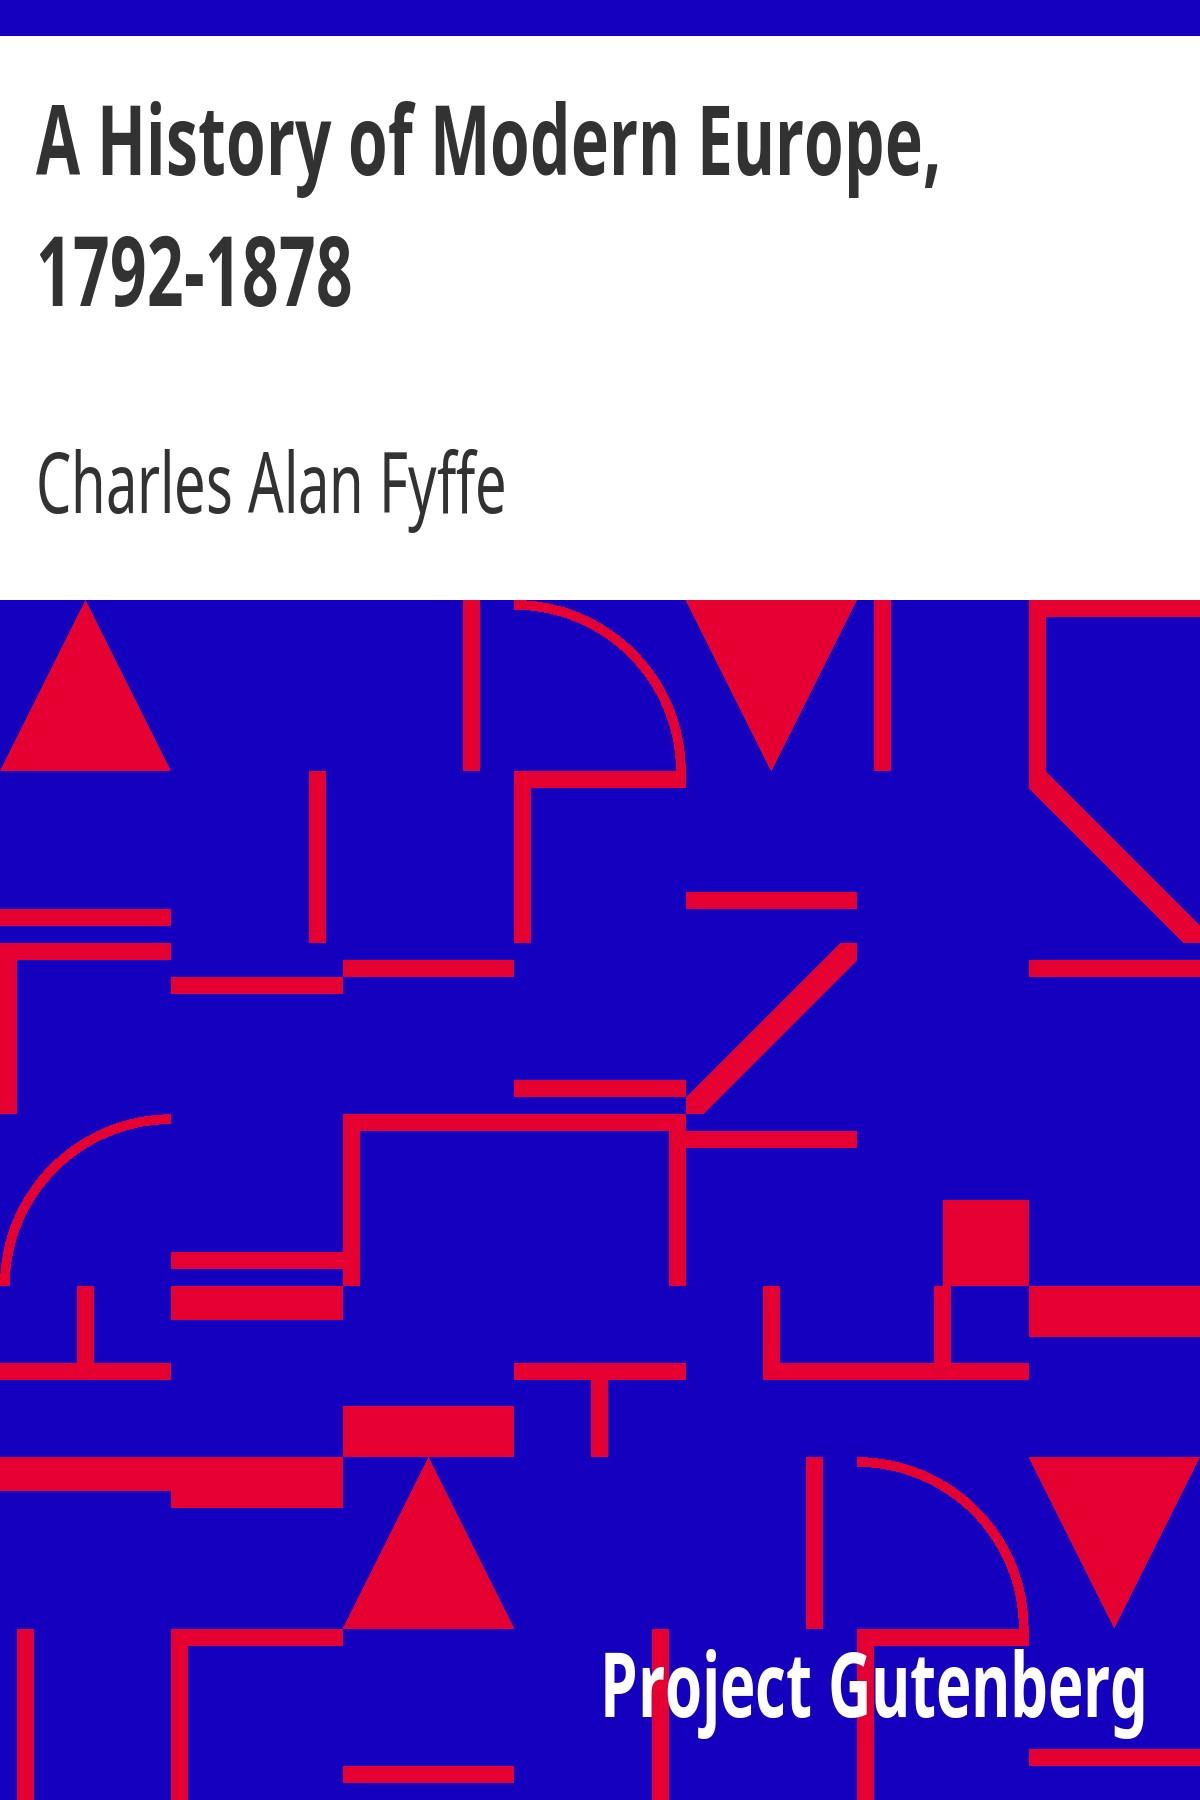 Charles Alan Fyffe A History of Modern Europe, 1792-1878